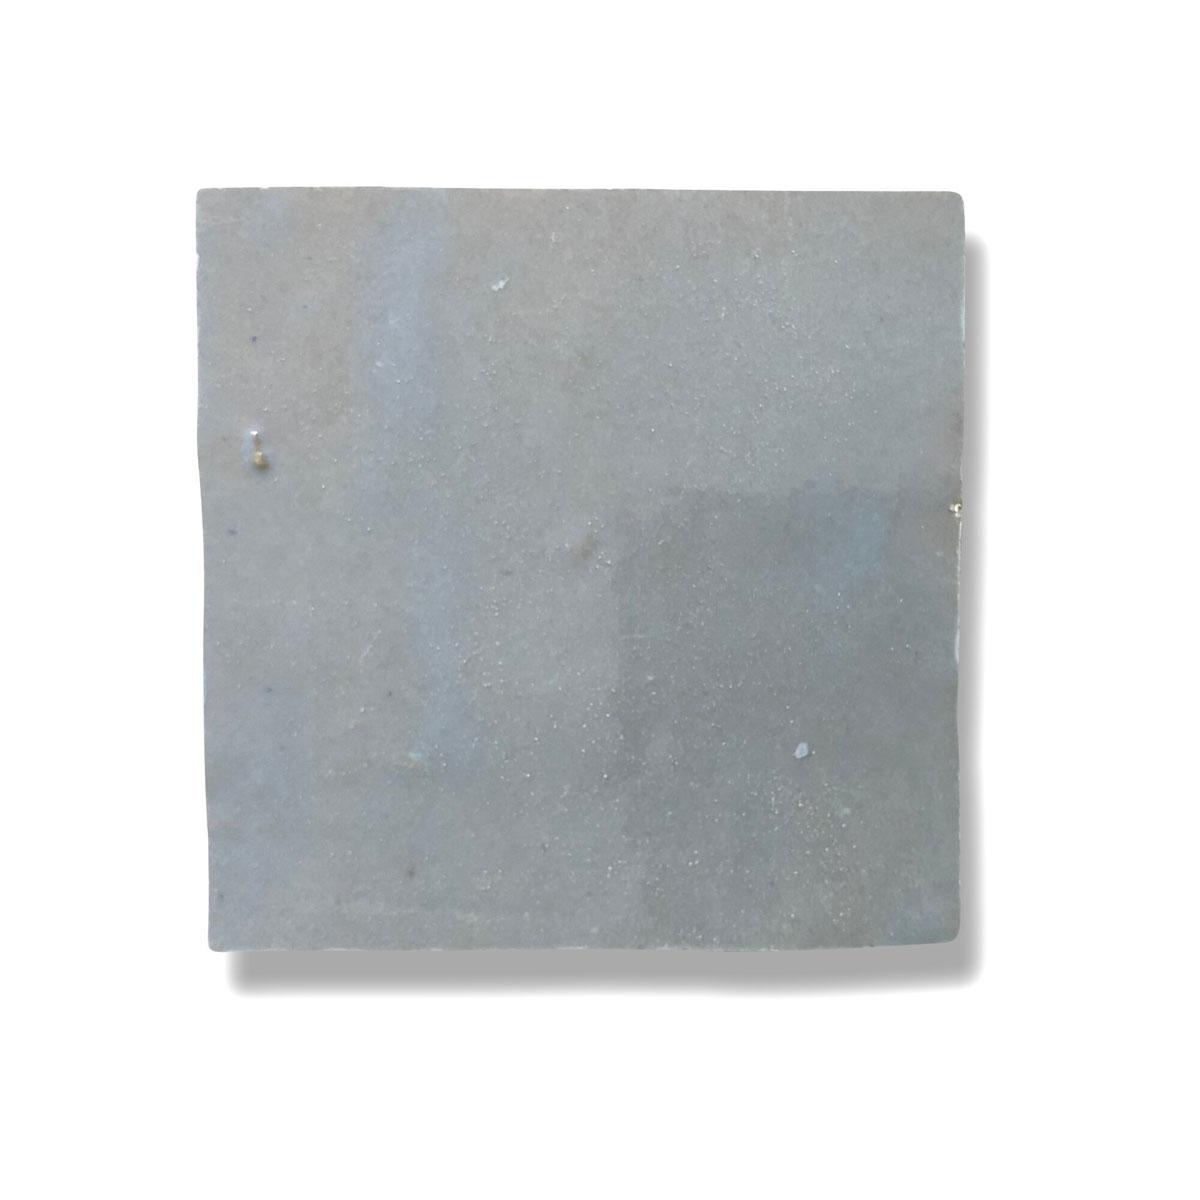 Clay Zellige - Blue Moon - Moroccan feature tiles - Stone3 Brisbane